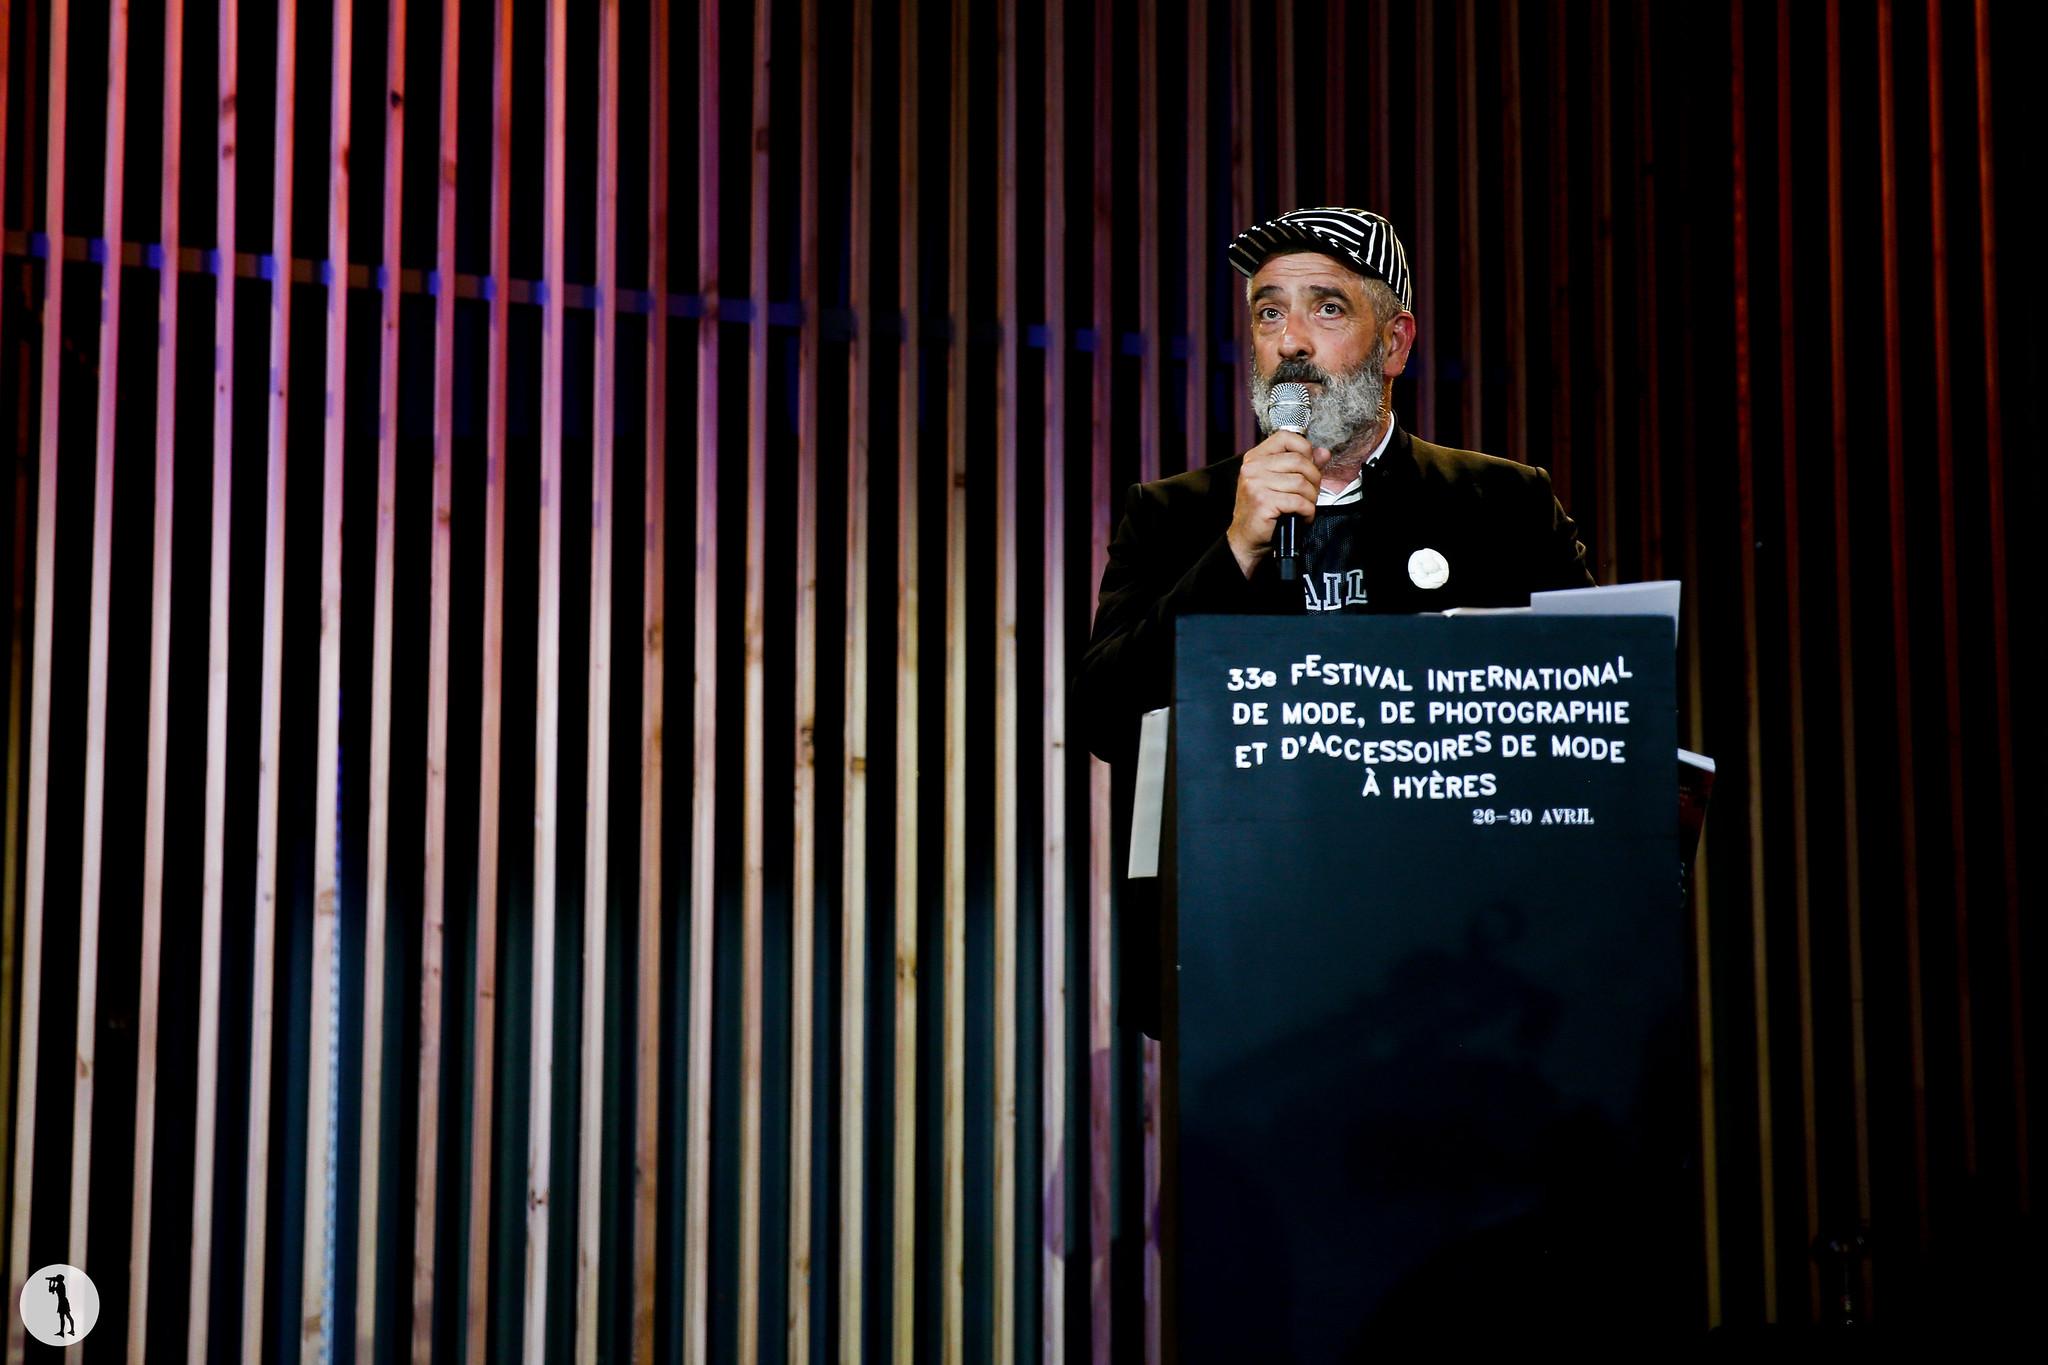 Jean-Pierre Blanc - Festival de Hyeres 2018 (1)